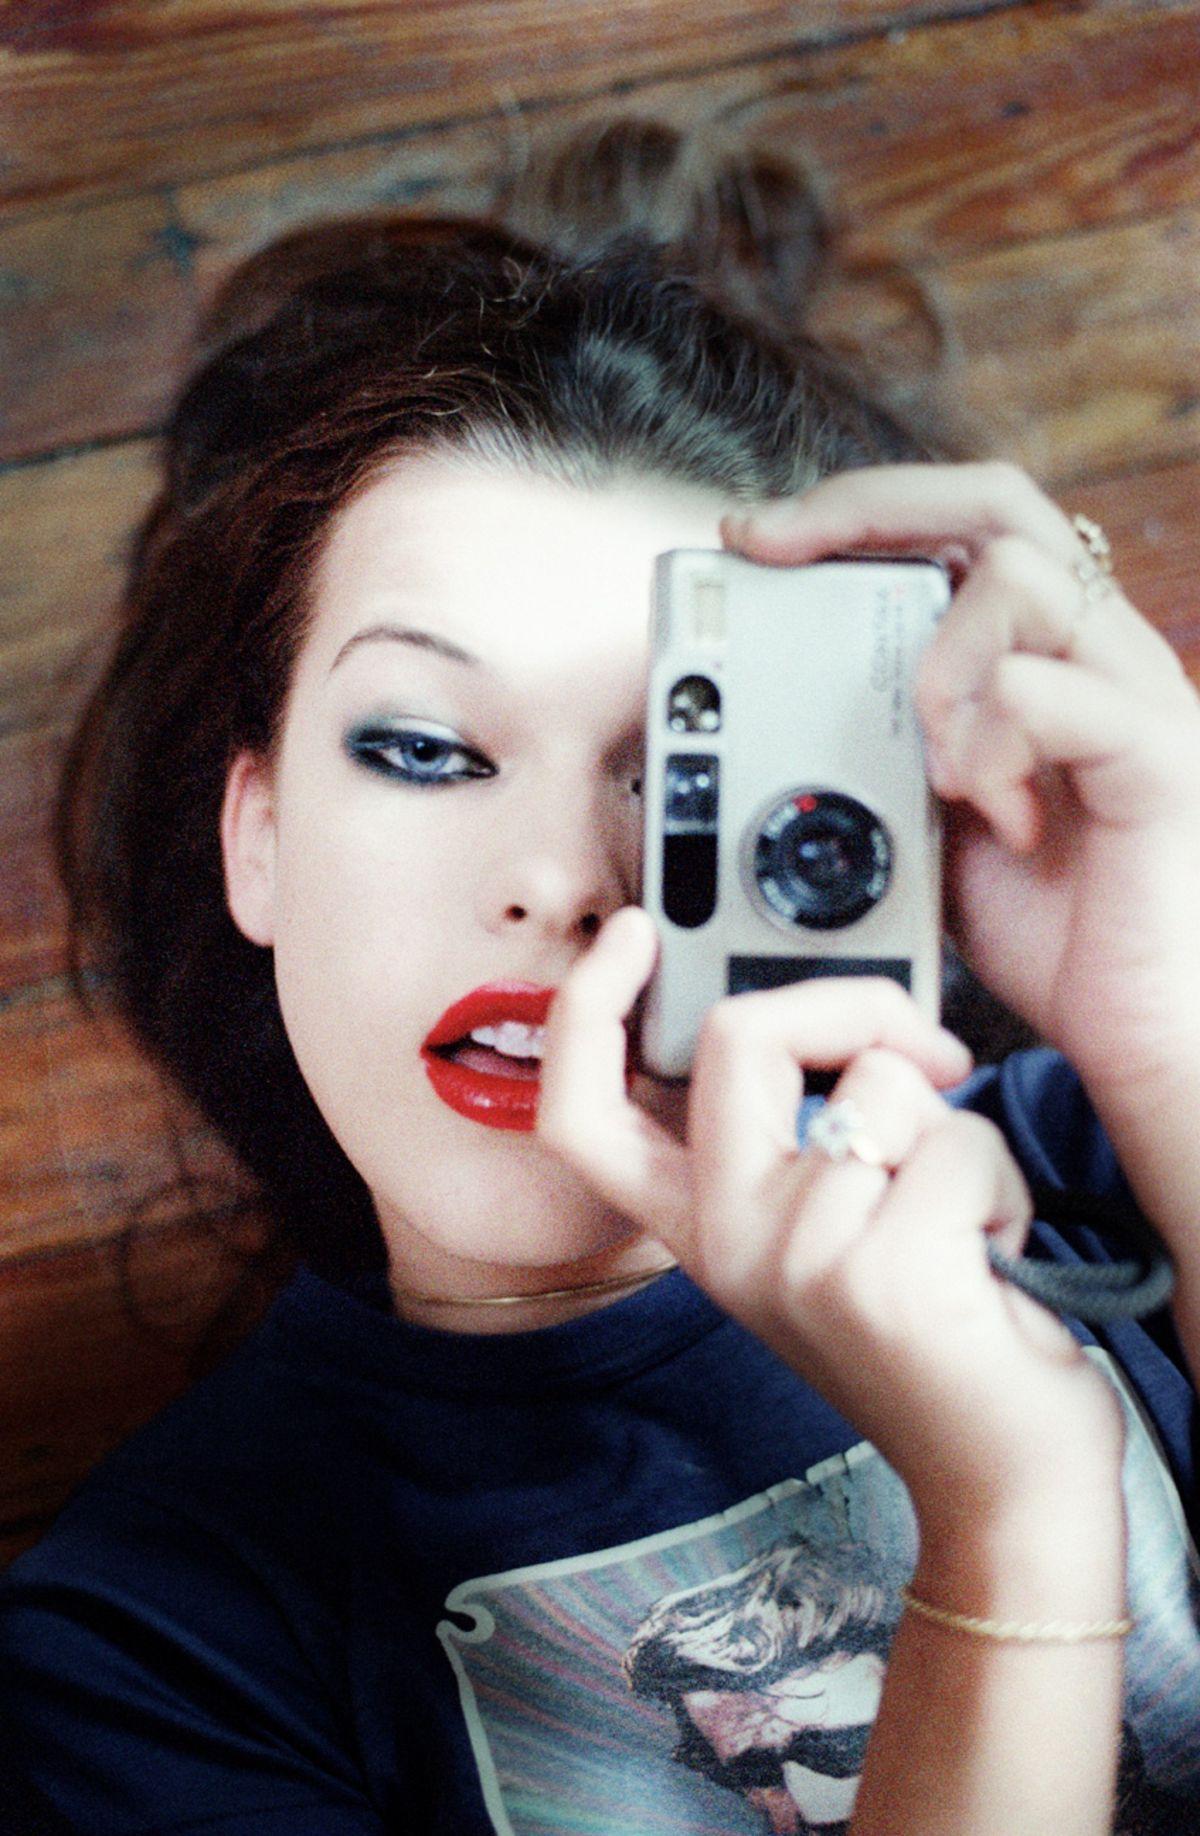 Милла Йовович (Milla Jovovich) в фотосессии Криса Флойда (Chris Floyd).